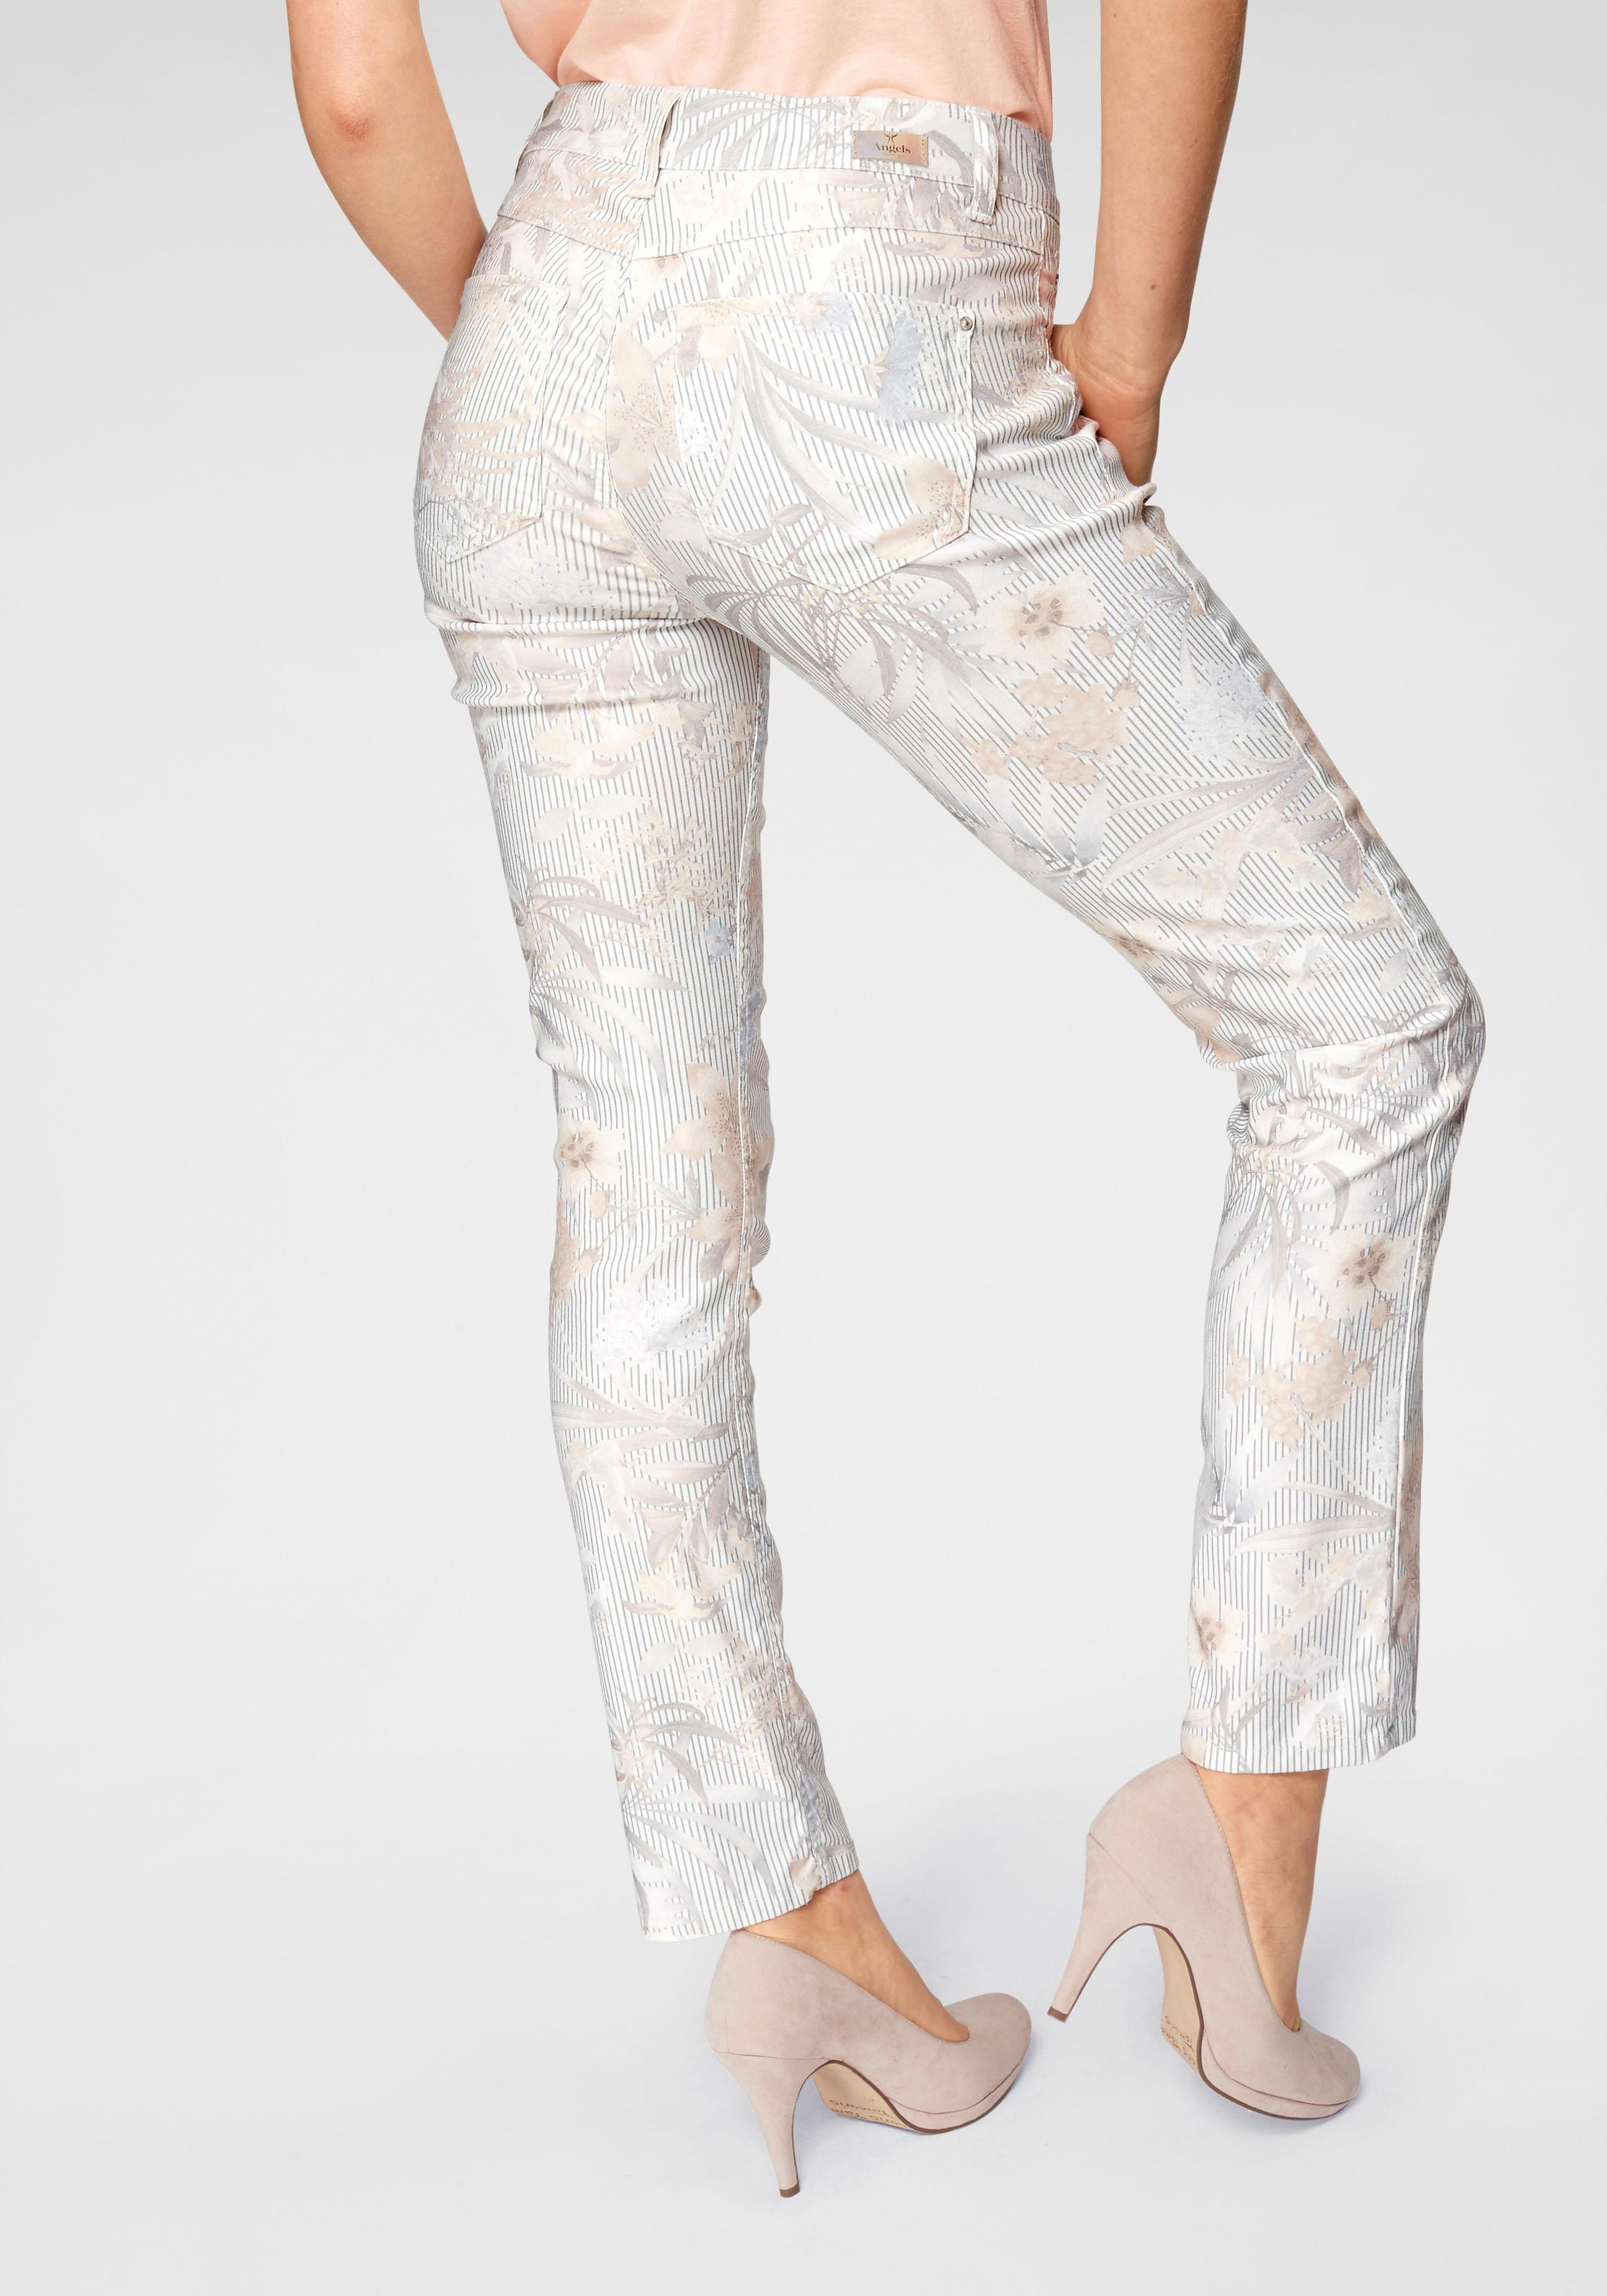 Image of ANGELS Ankle-Jeans »Cici bedruckt«